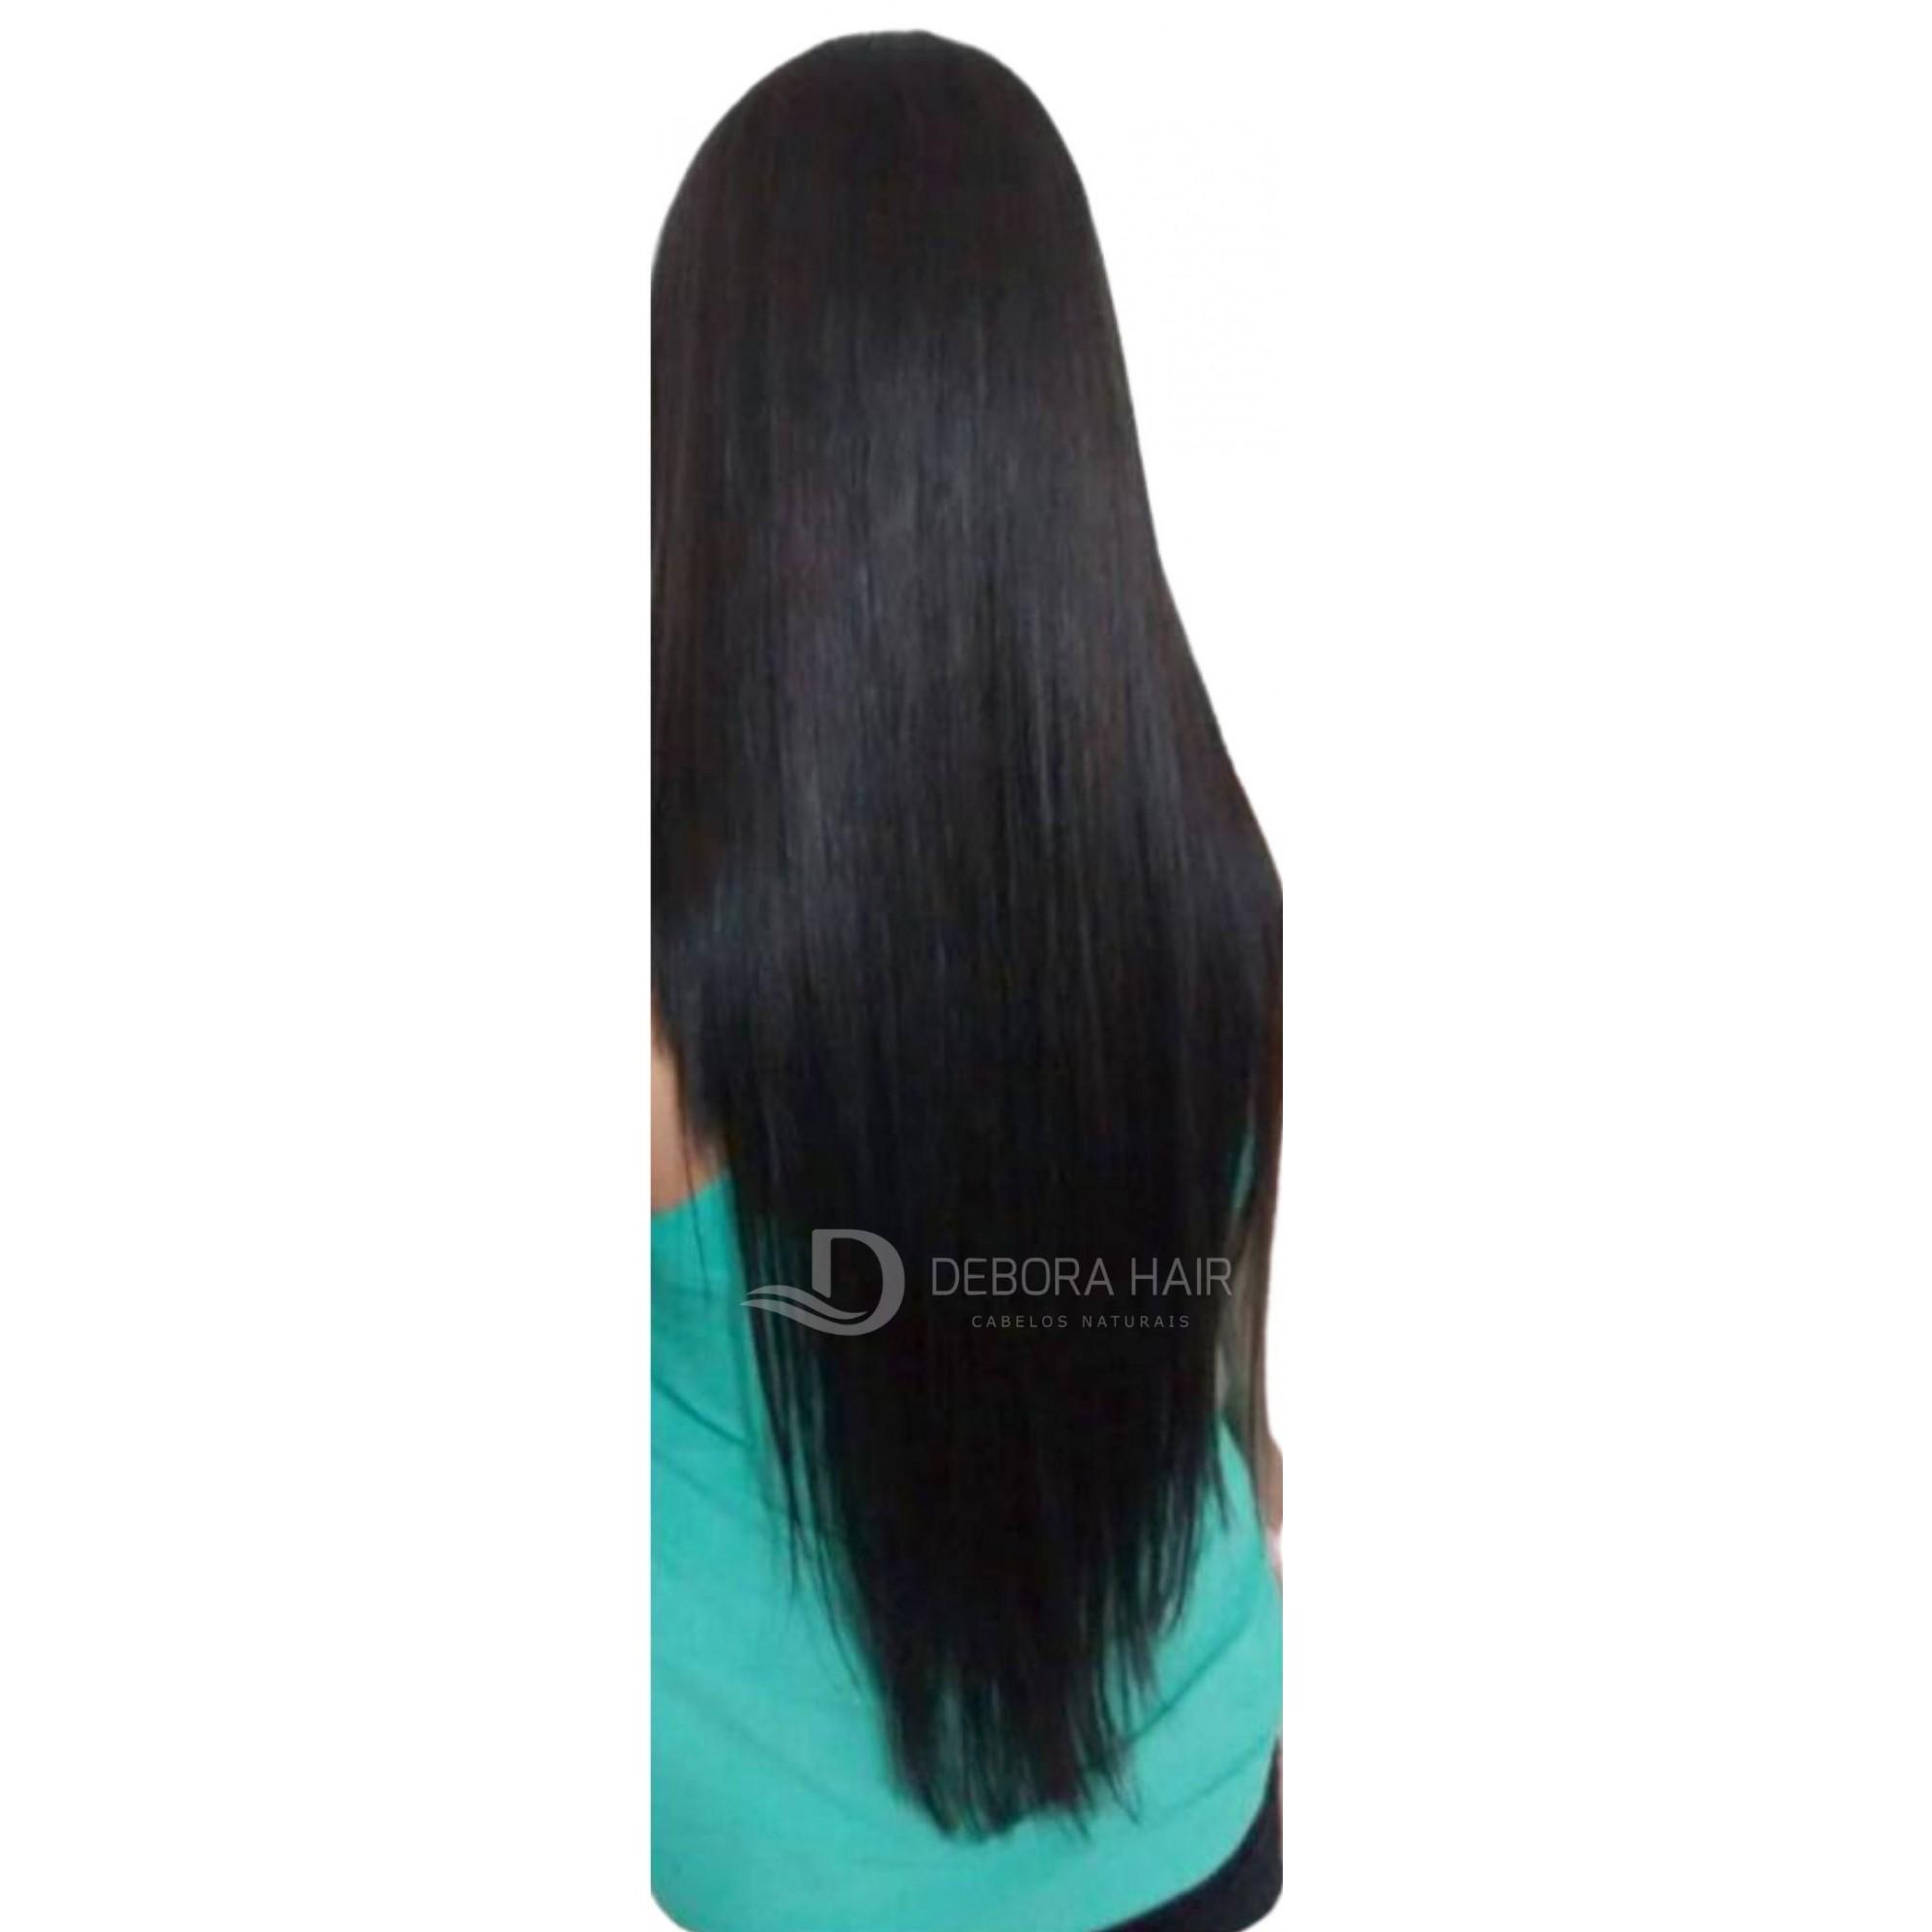 Mega Hair Fita Adesiva 55 cm (SN) N. 400 20 Peças  - DEBORA HAIR